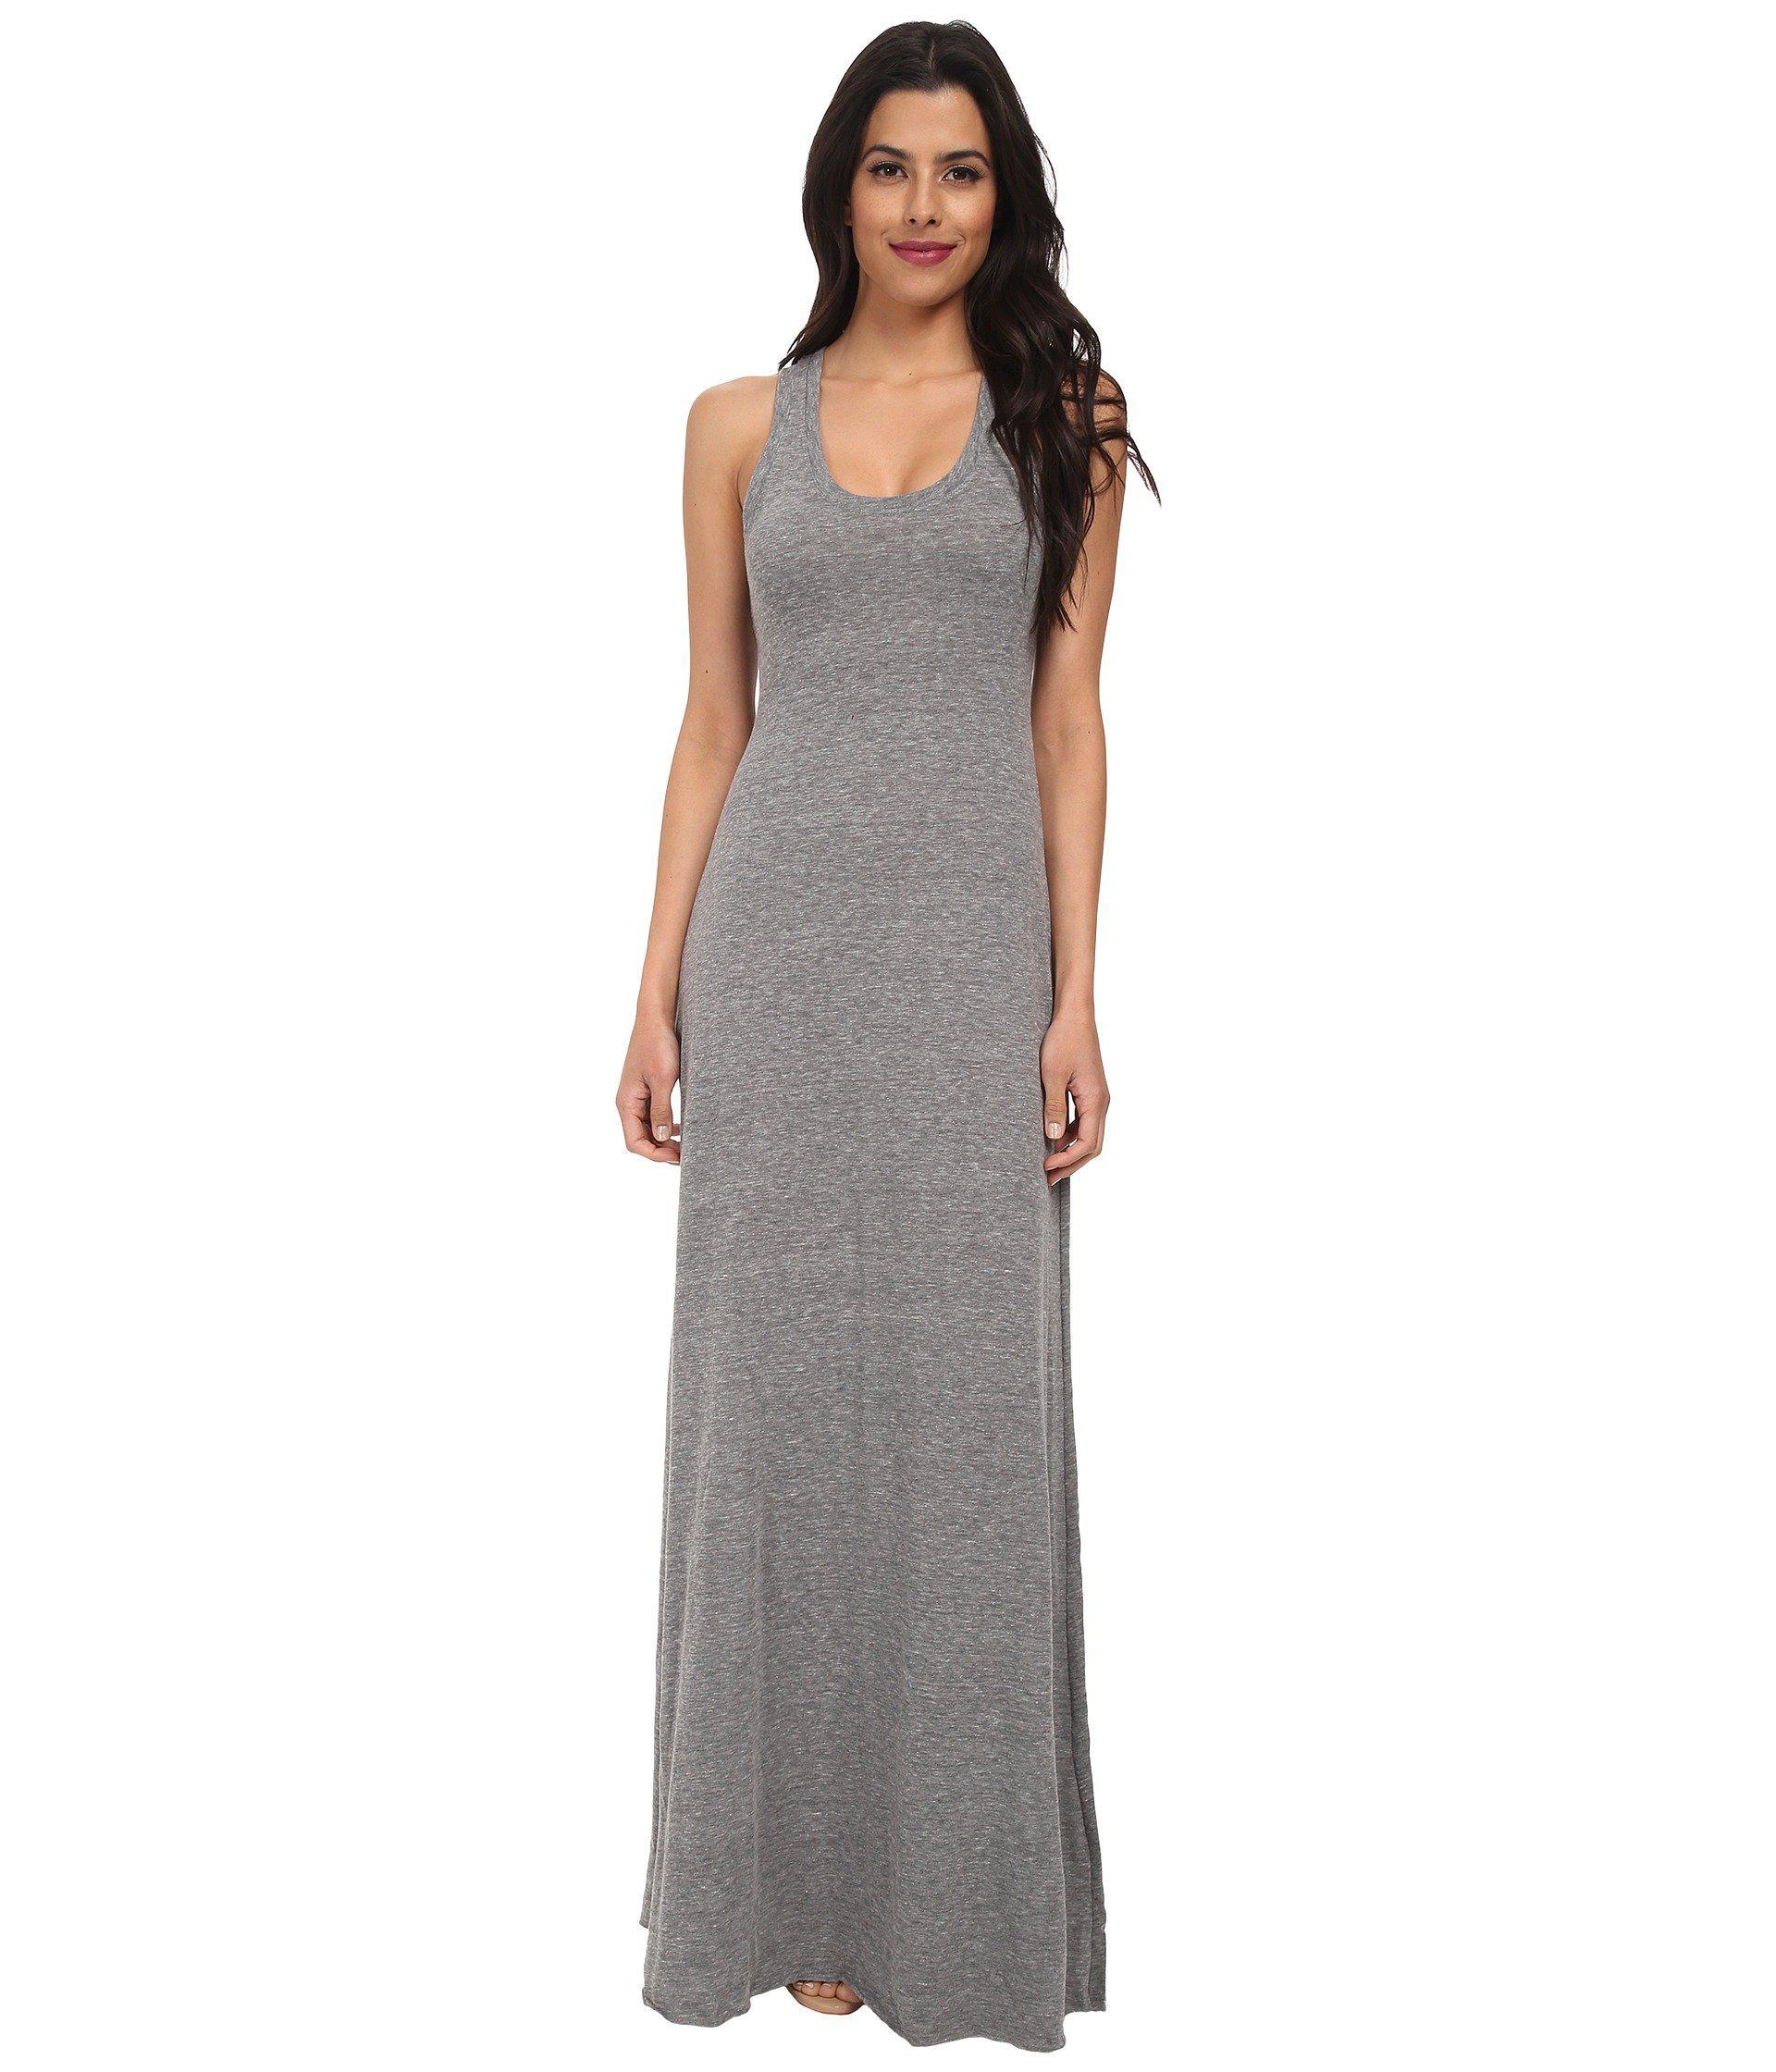 Lyst Alternative Apparel Racerback Maxi Dress In Gray Save